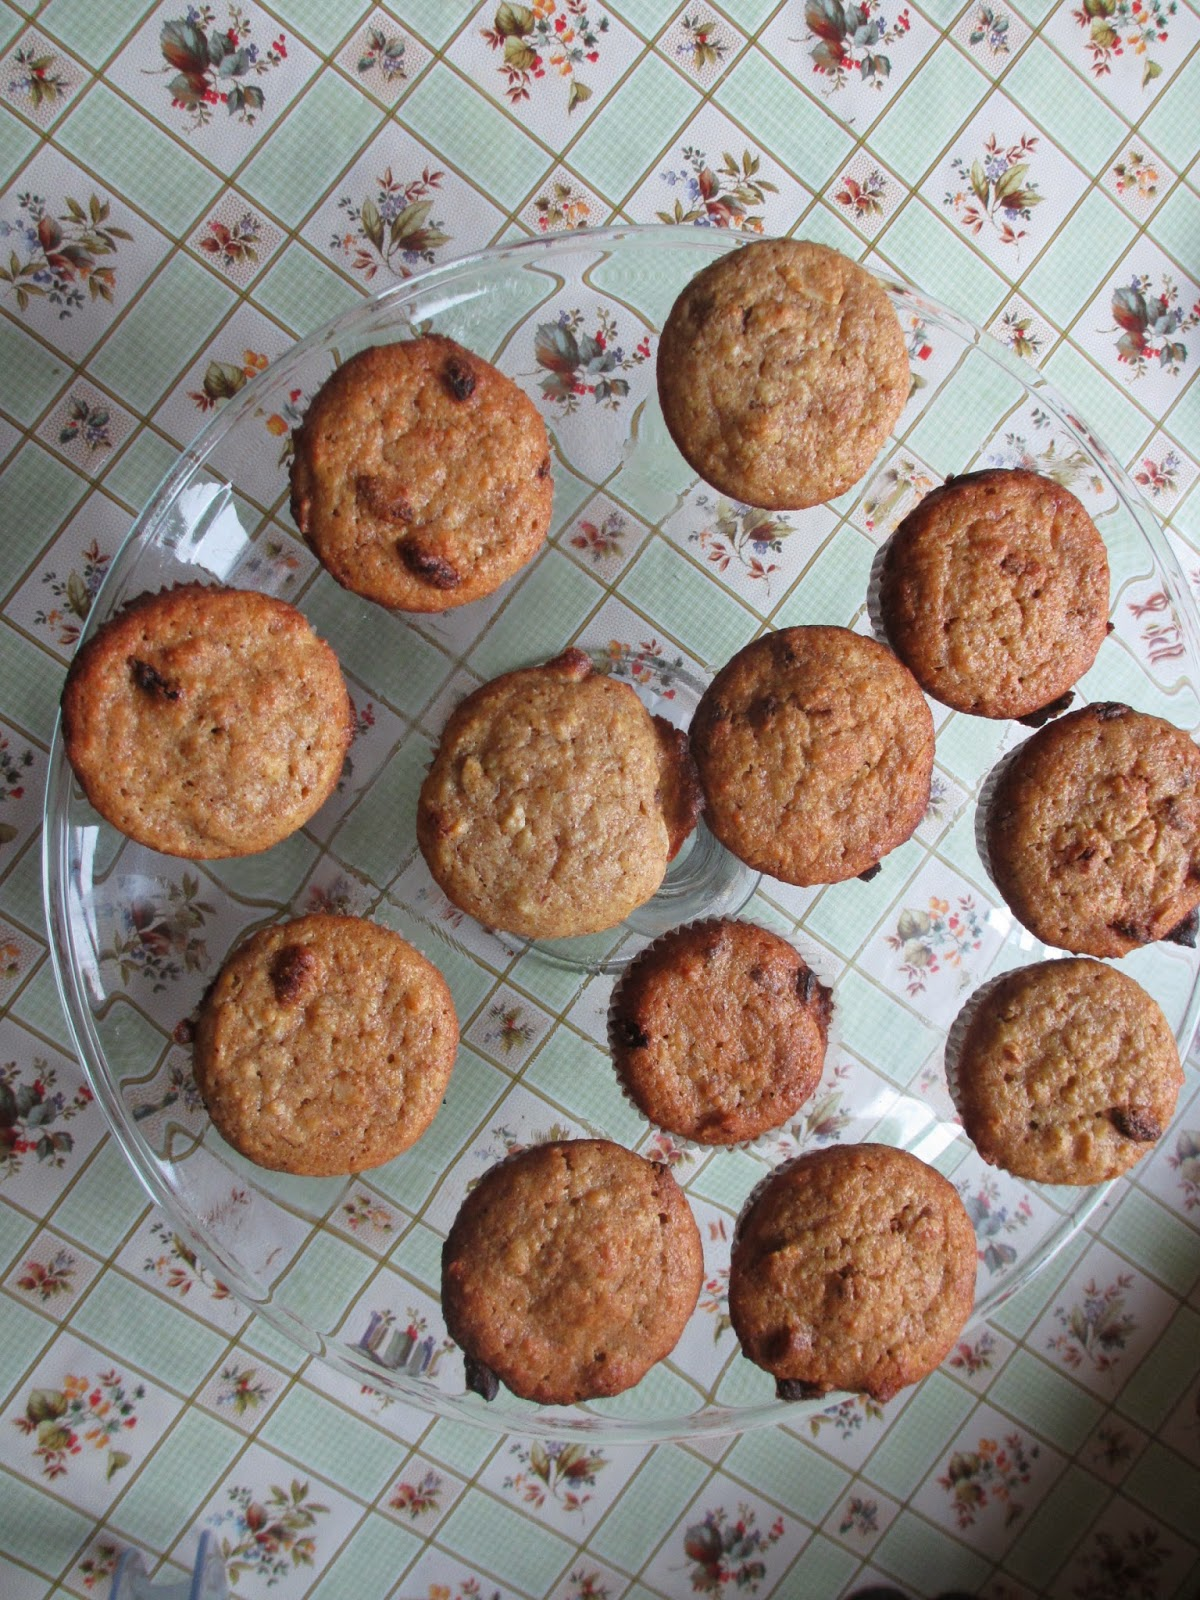 muffinid kohupiimaga